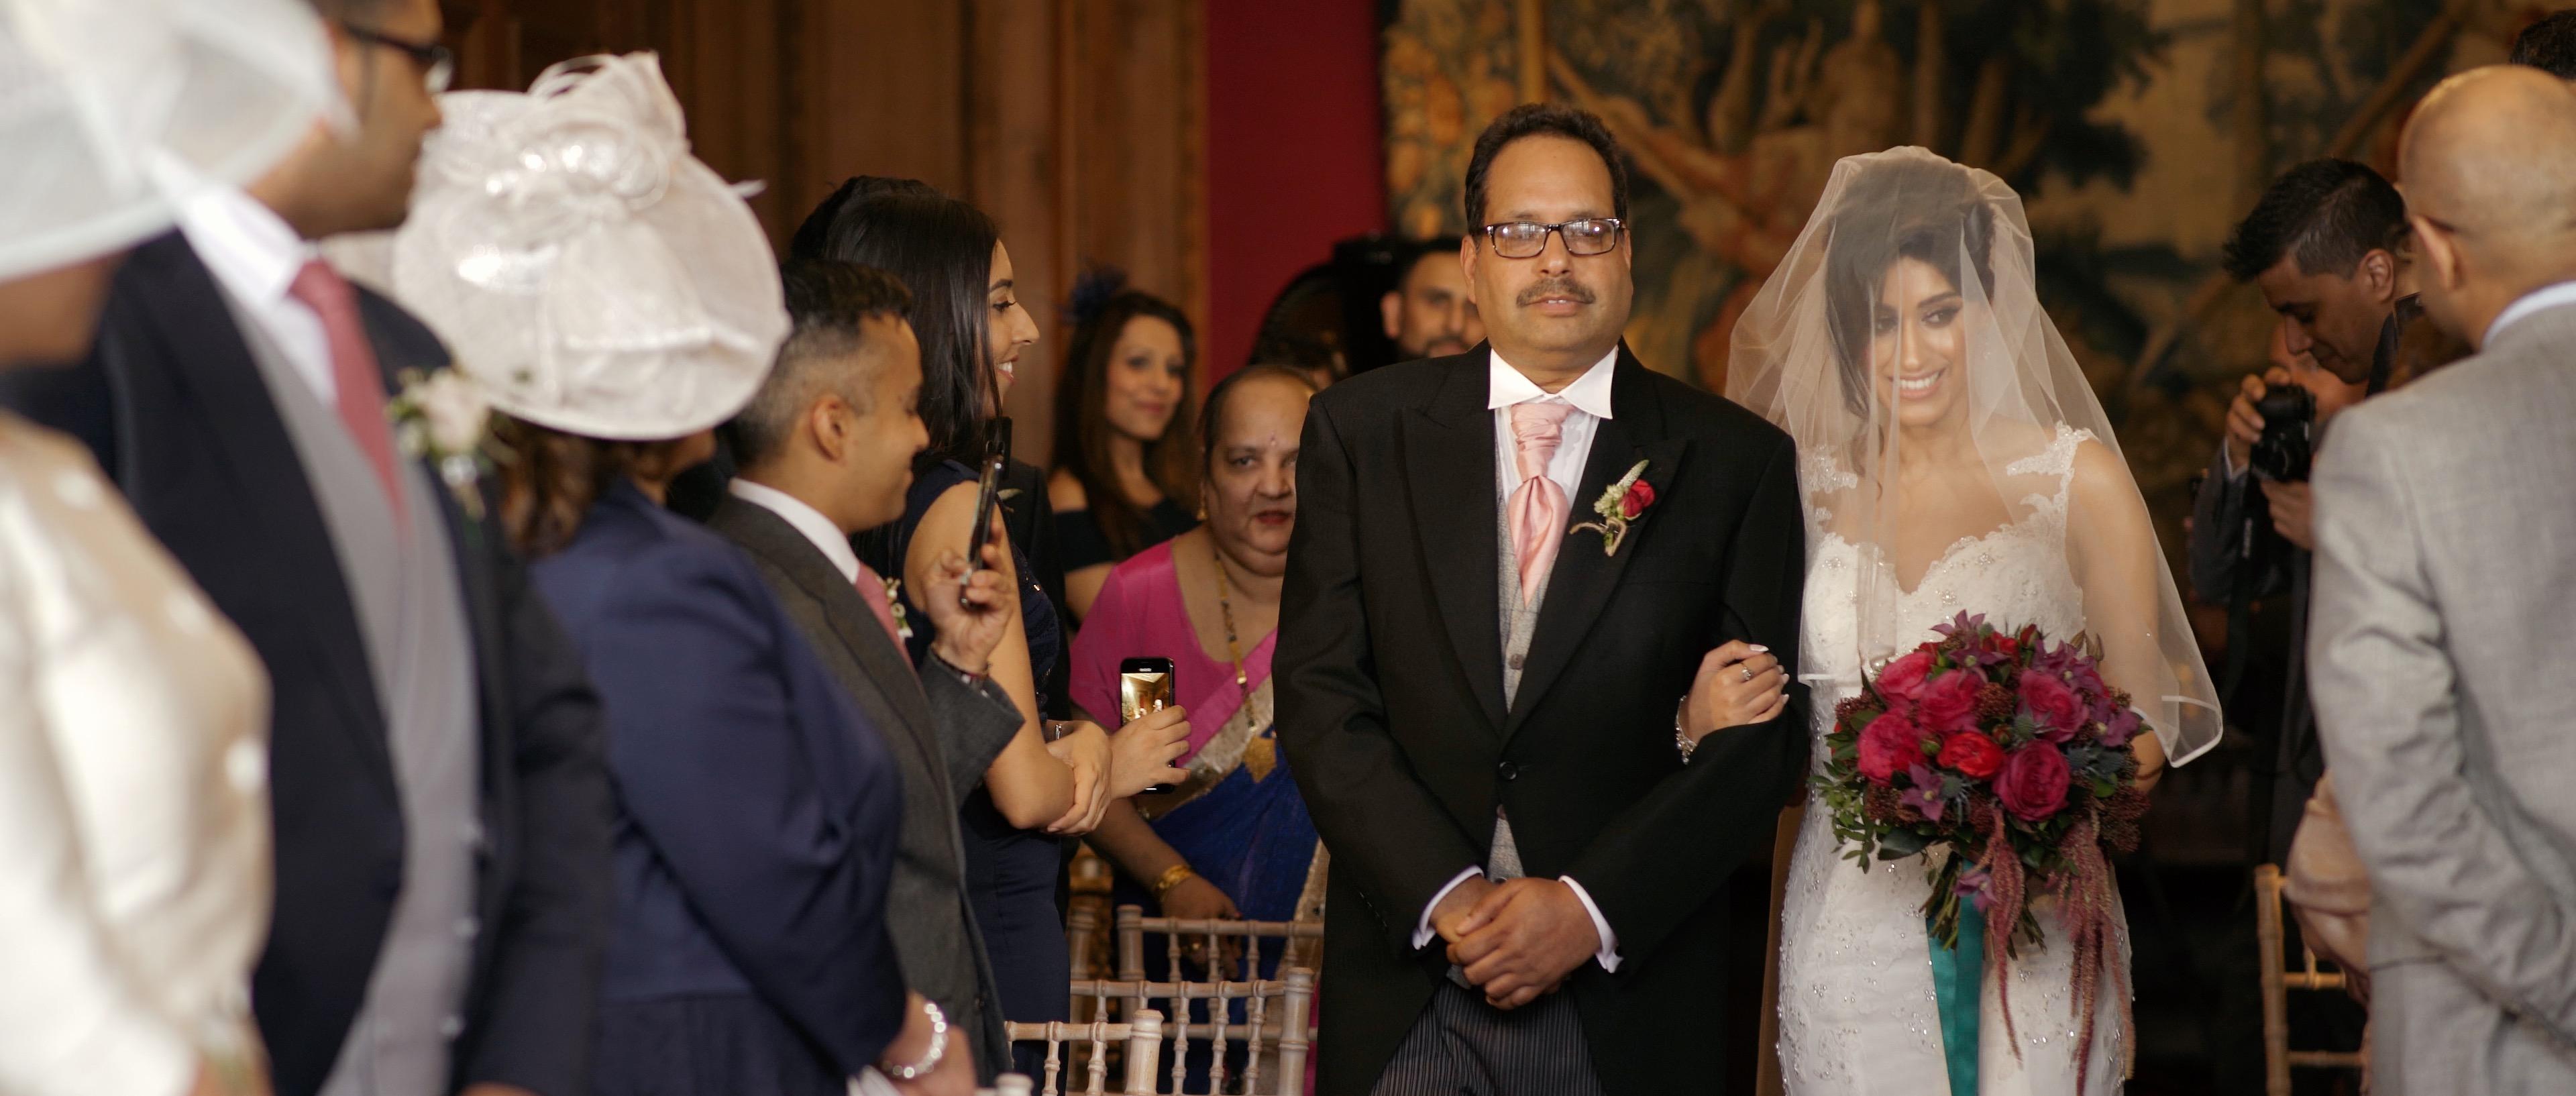 thornton manor wedding indian wedding